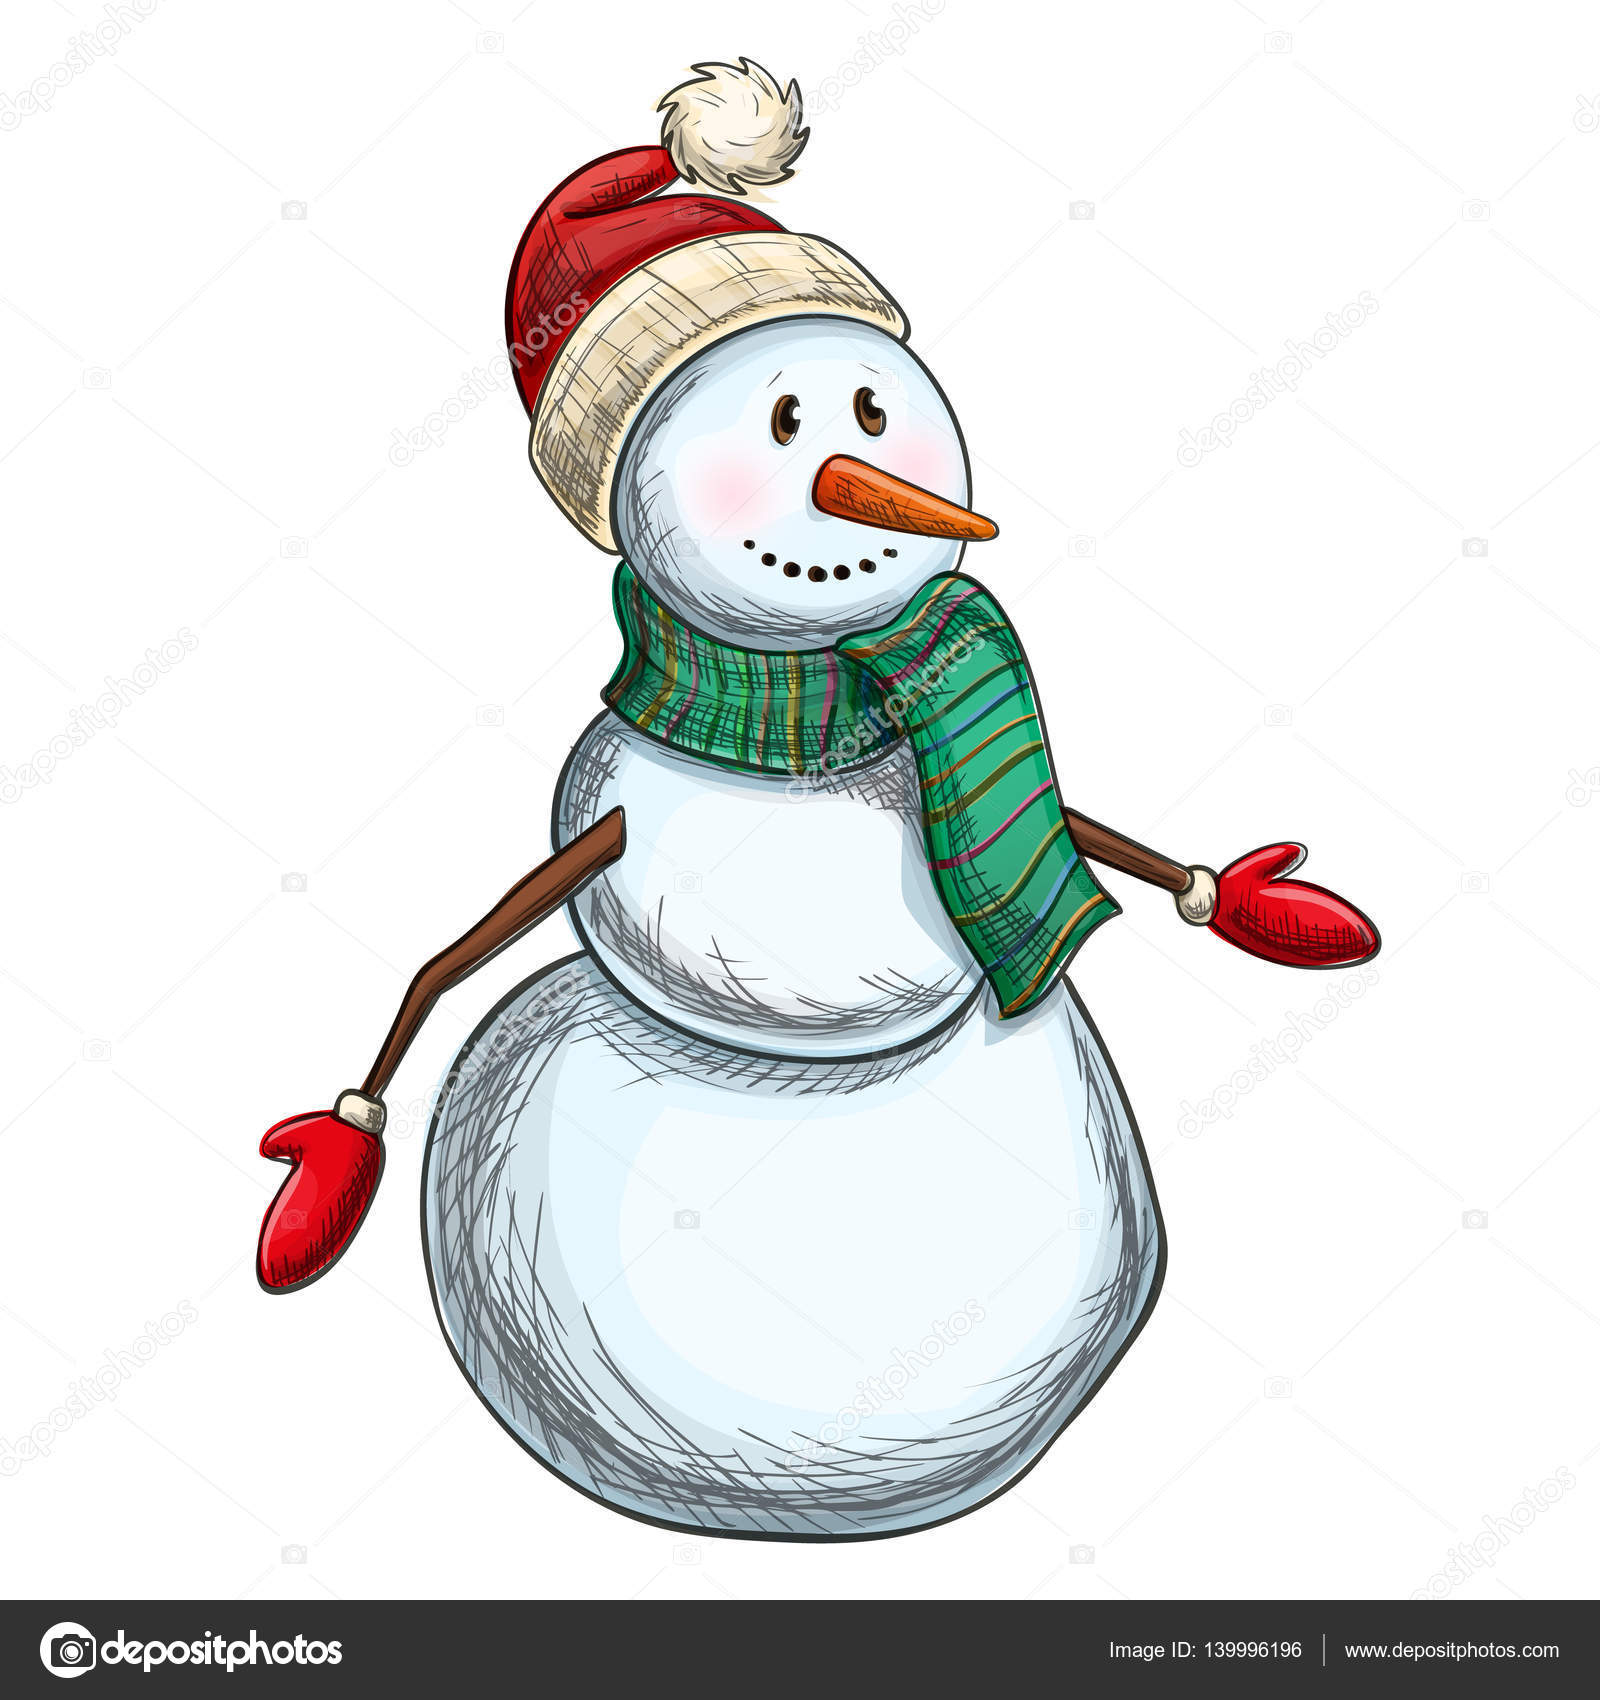 Colorful Sketch Of Christmas Snowman Stock Vector C Alffisky